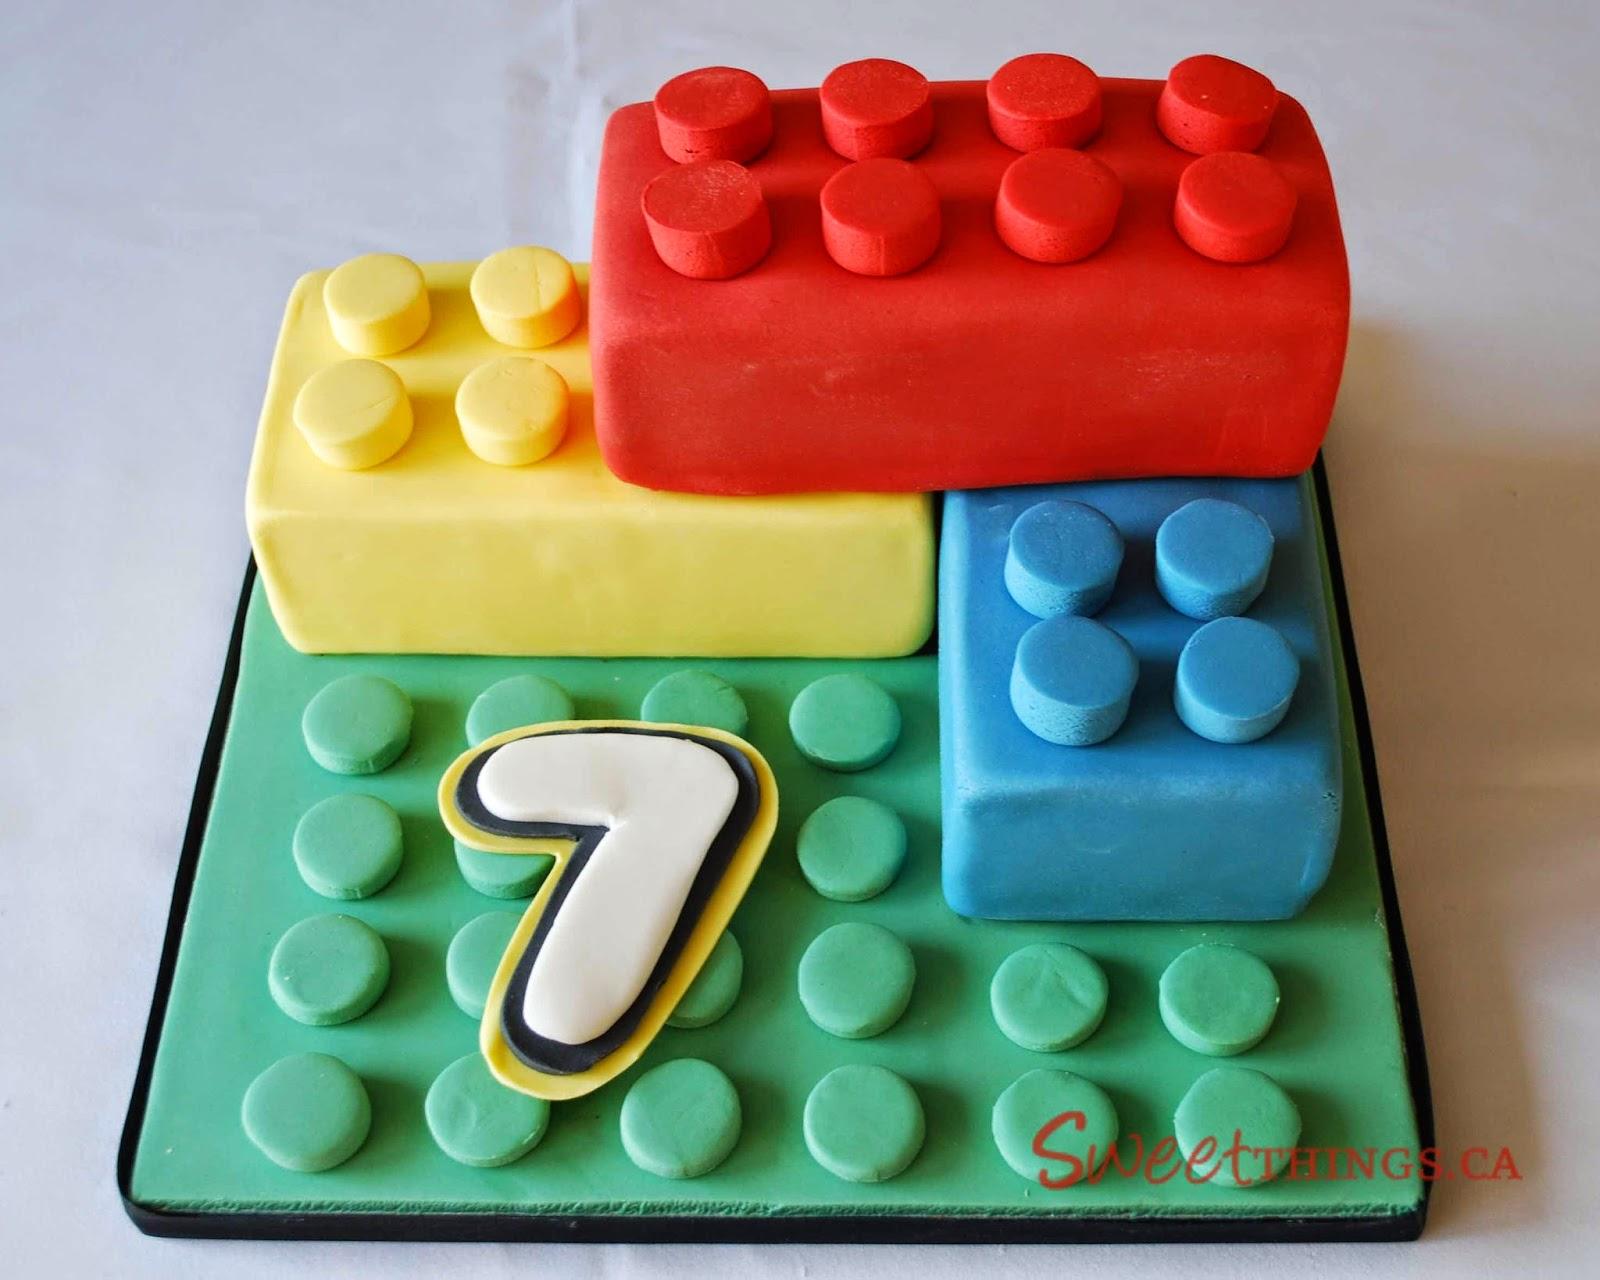 Lego Themed Birthday Party Cakes